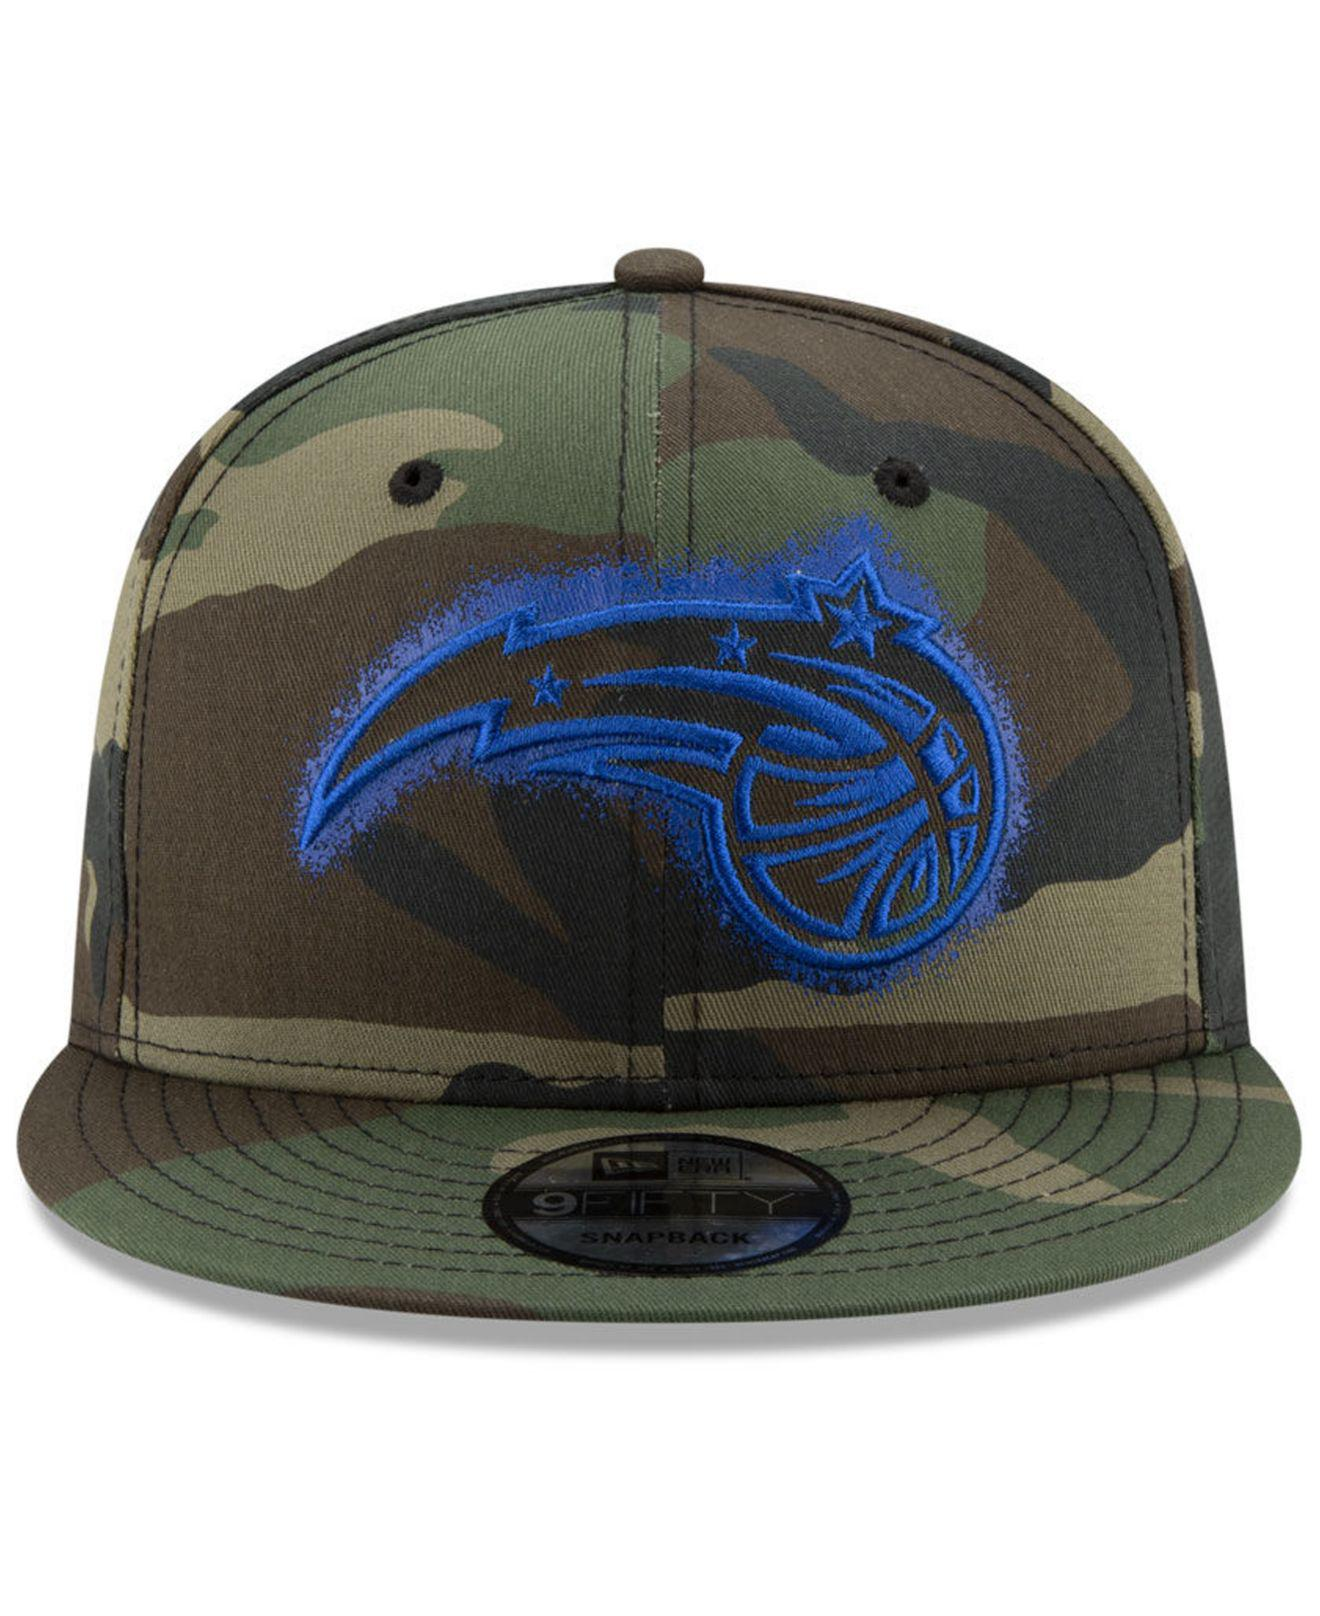 online store fdb55 ce19e Lyst - KTZ Orlando Magic Overspray 9fifty Snapback Cap in Green for Men